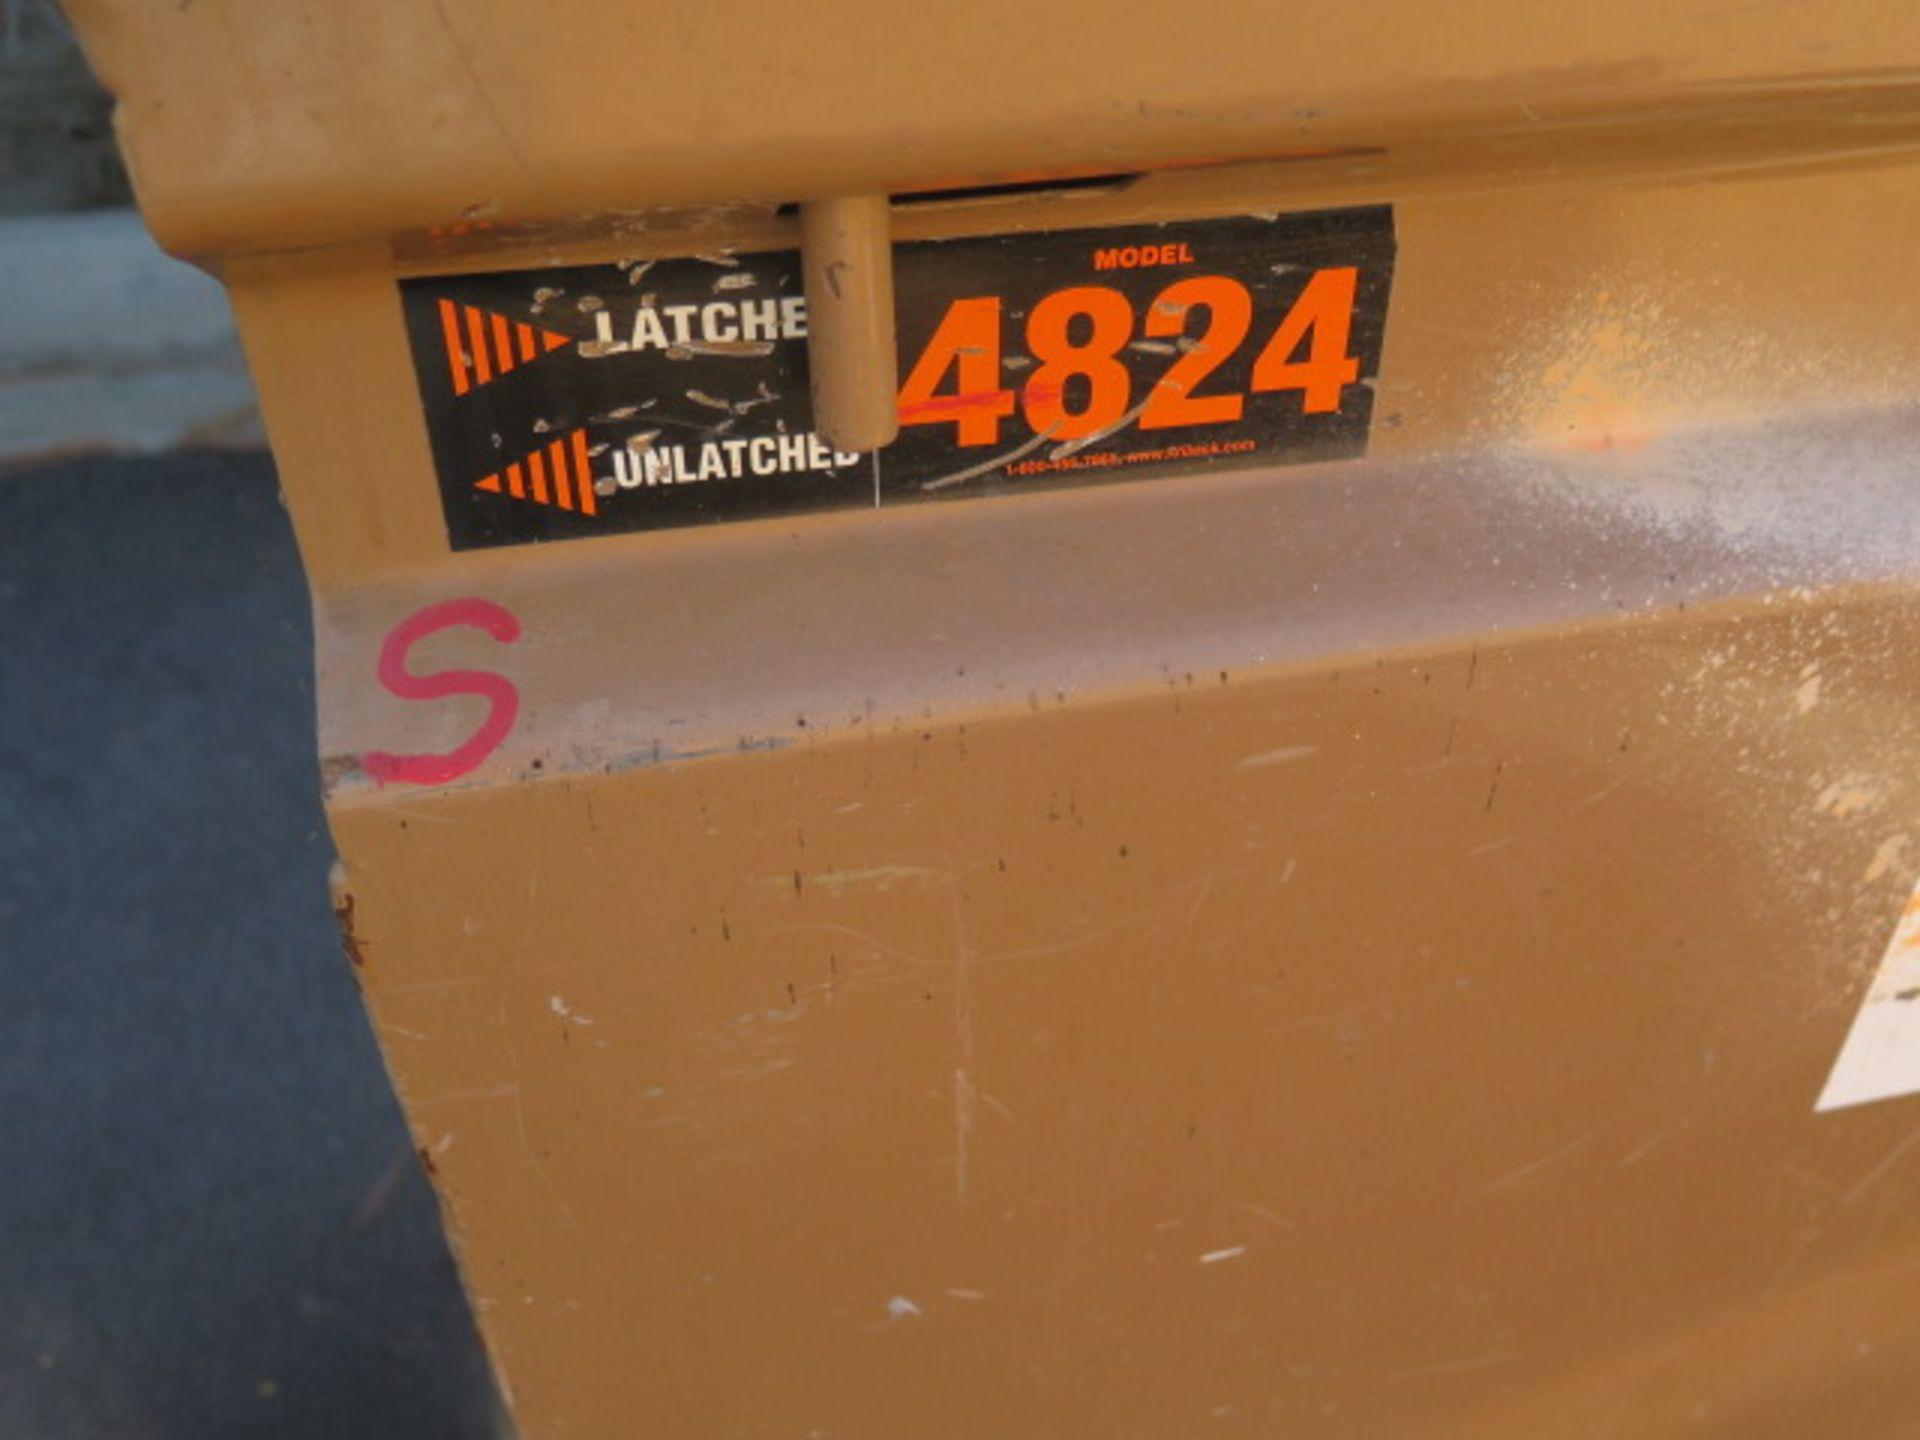 Knaack mdl. 4824 Rolling Job Box (SOLD AS-IS - NO WARRANTY) - Image 3 of 7